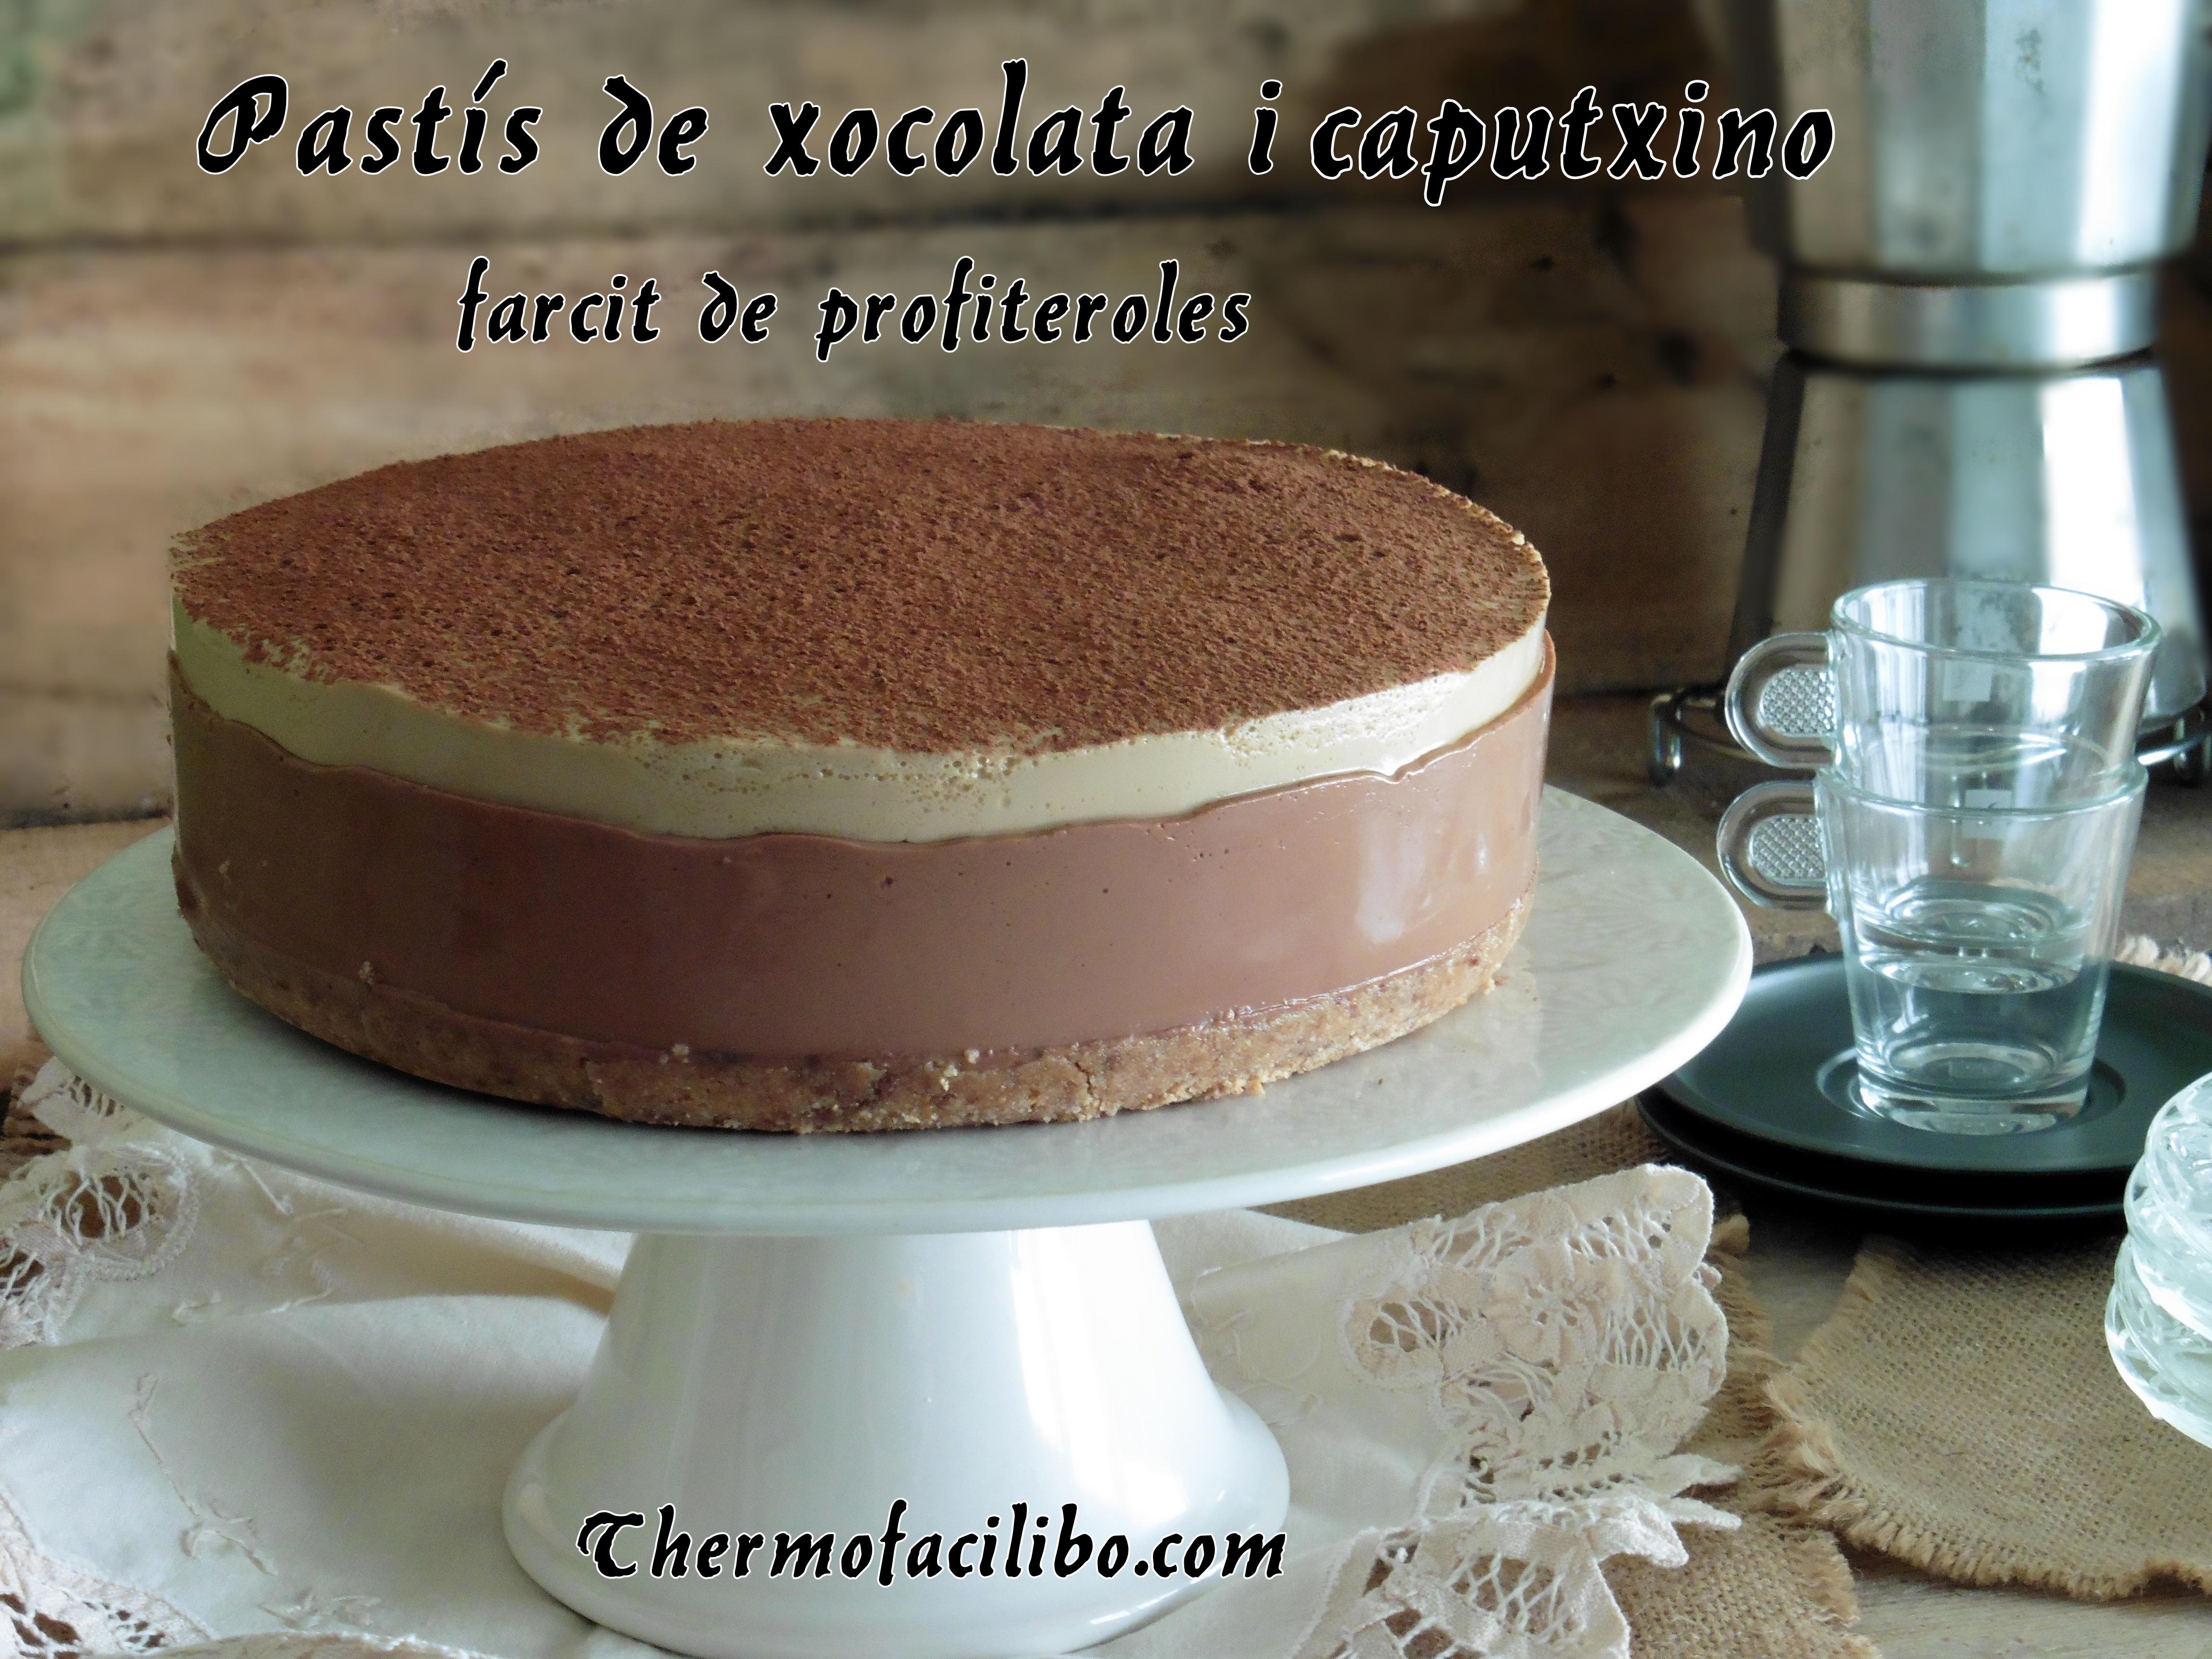 Pastís de xocolata i cafè farcit de profiteroles.....